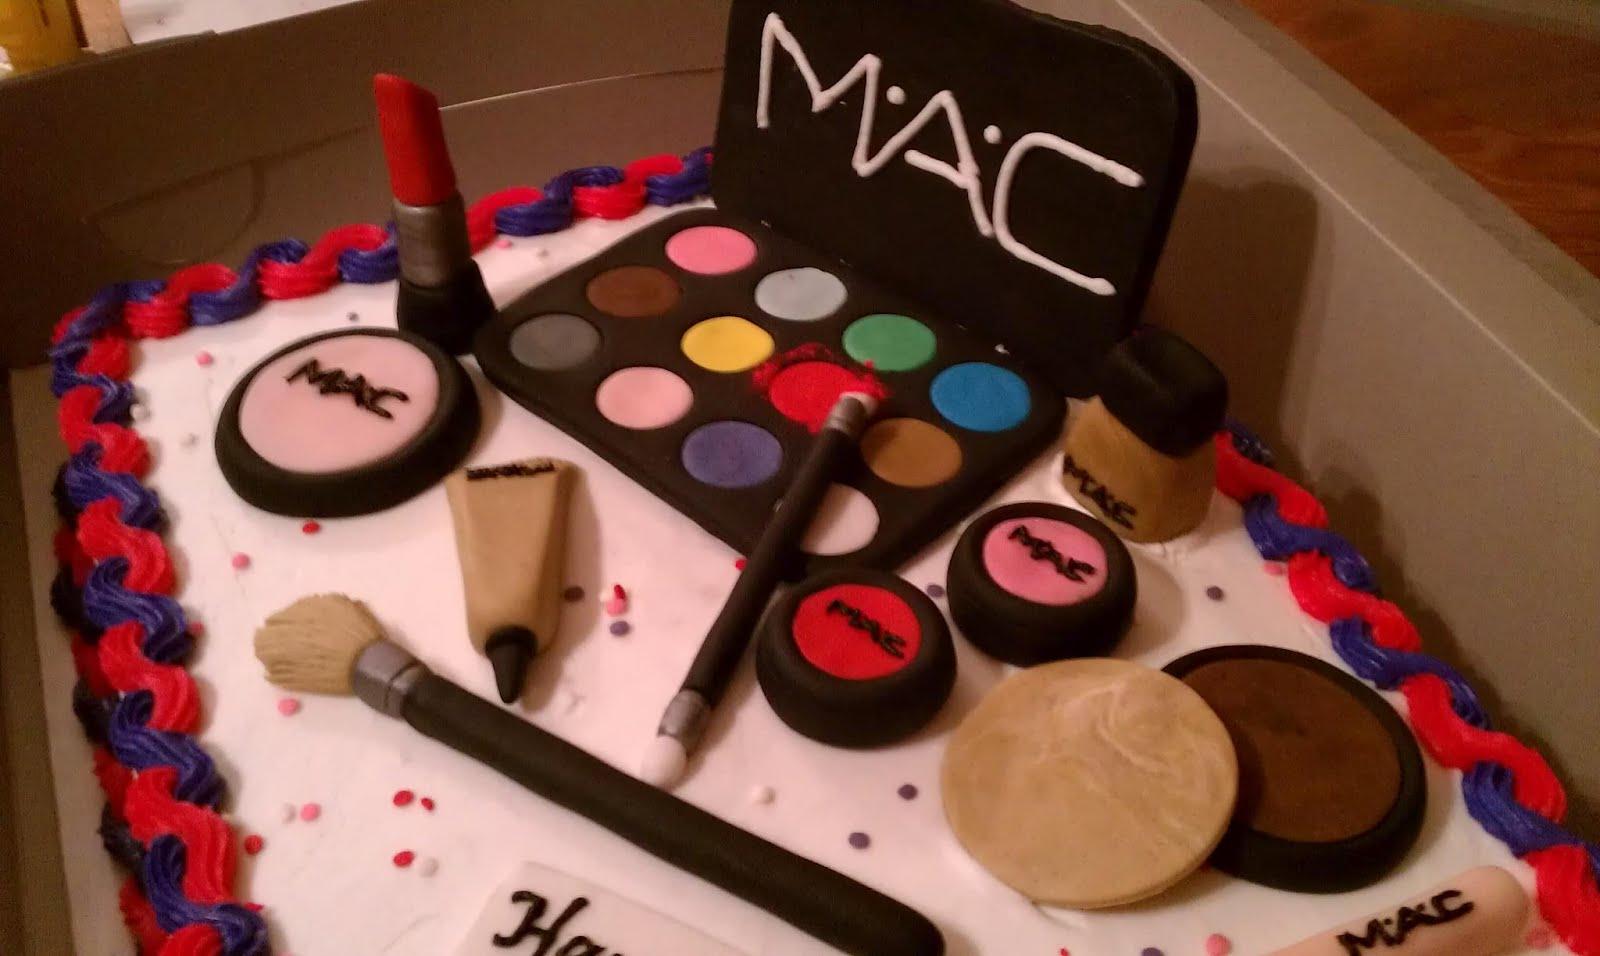 Mac Makeup Free Birthday Gift Arenda Stroy